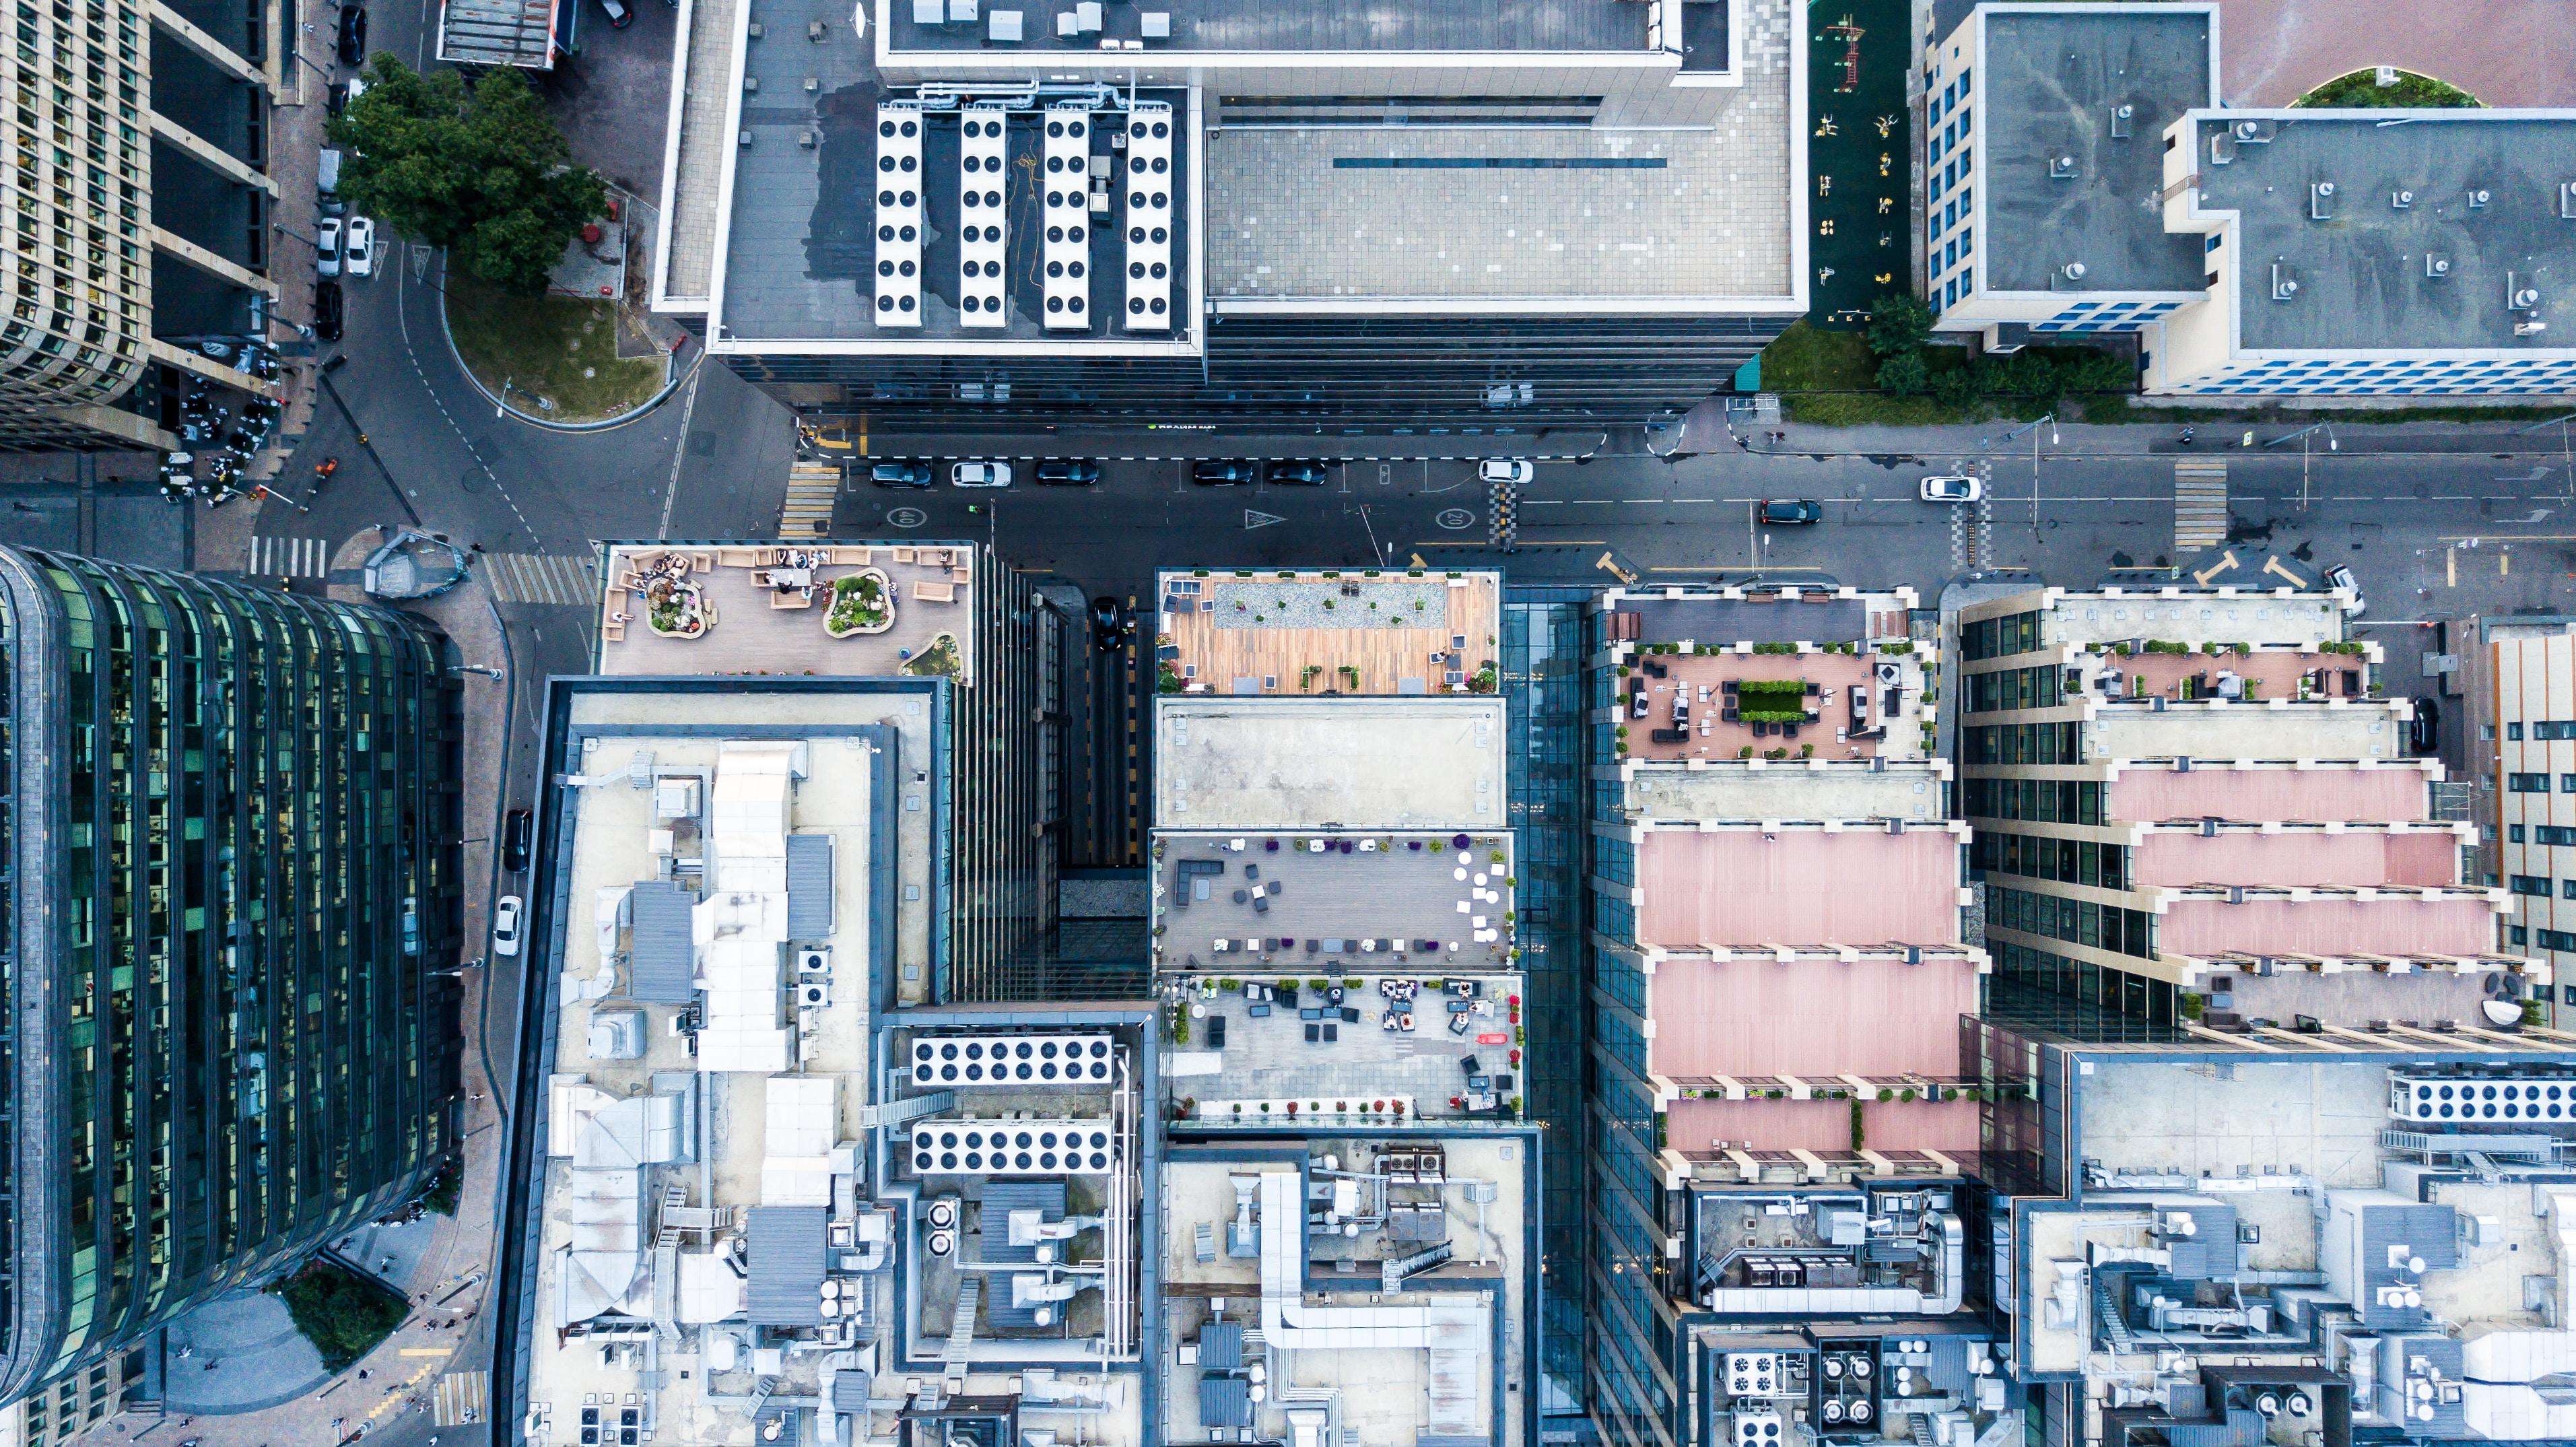 aerial shot of building